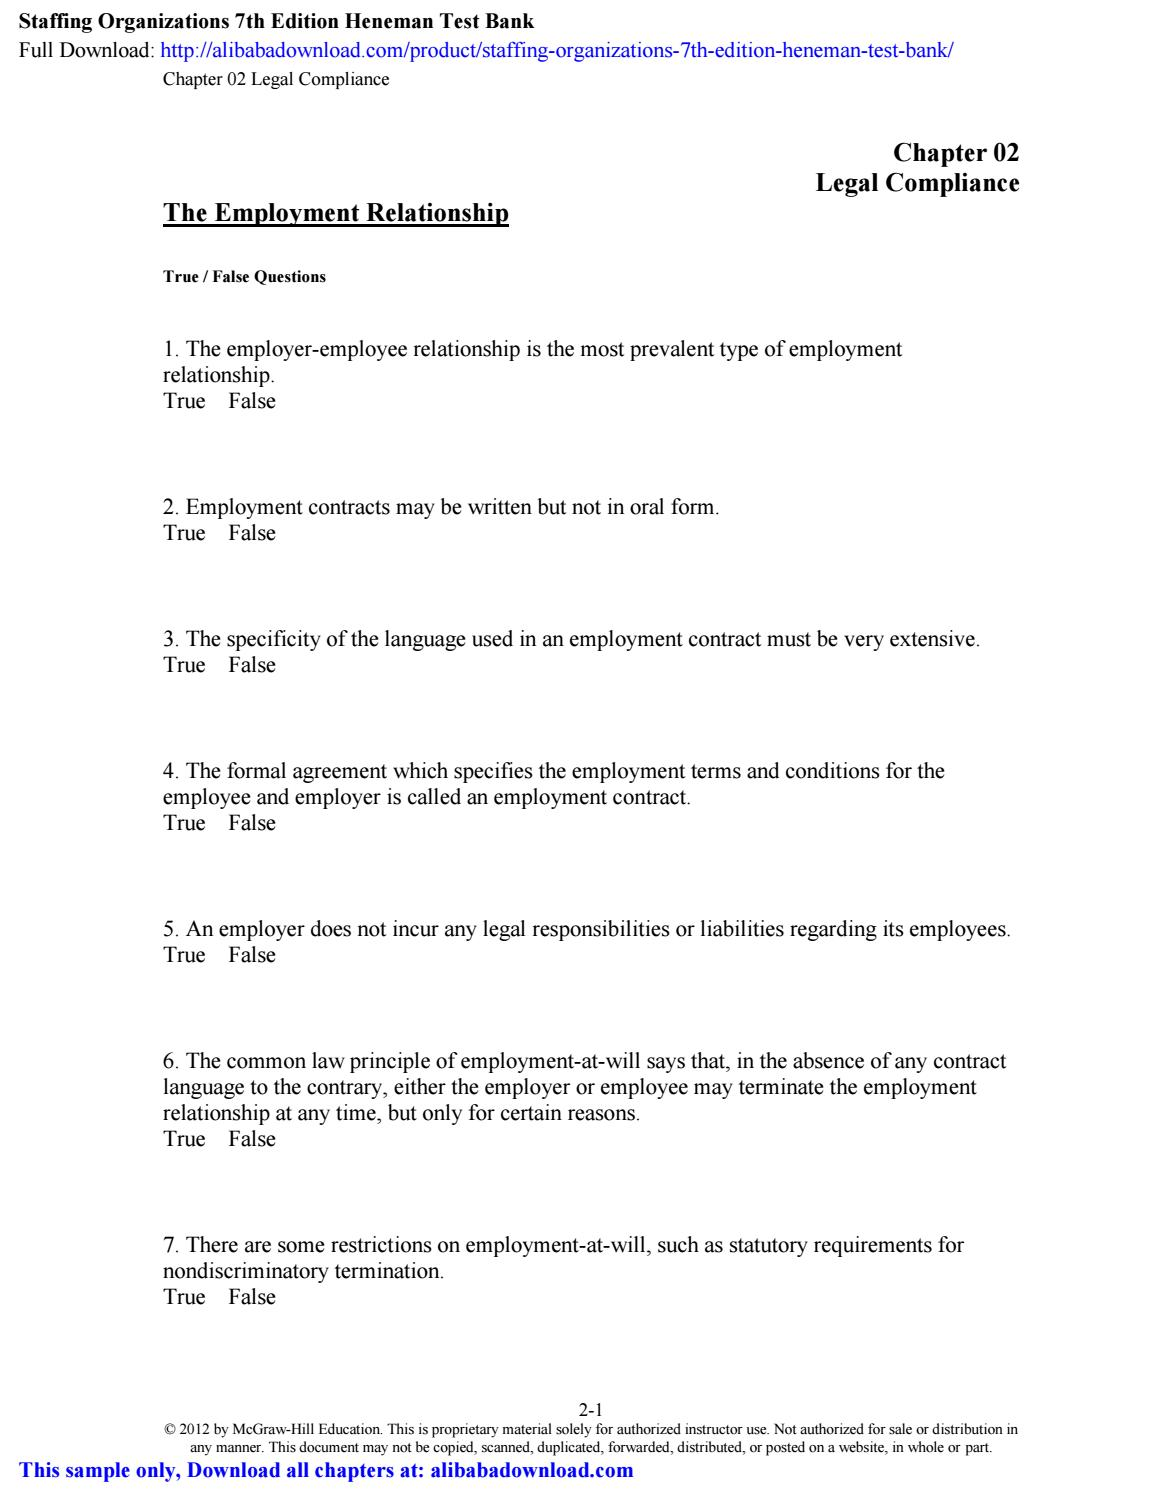 Staffing Organizations 7th Edition Heneman Test Bank by